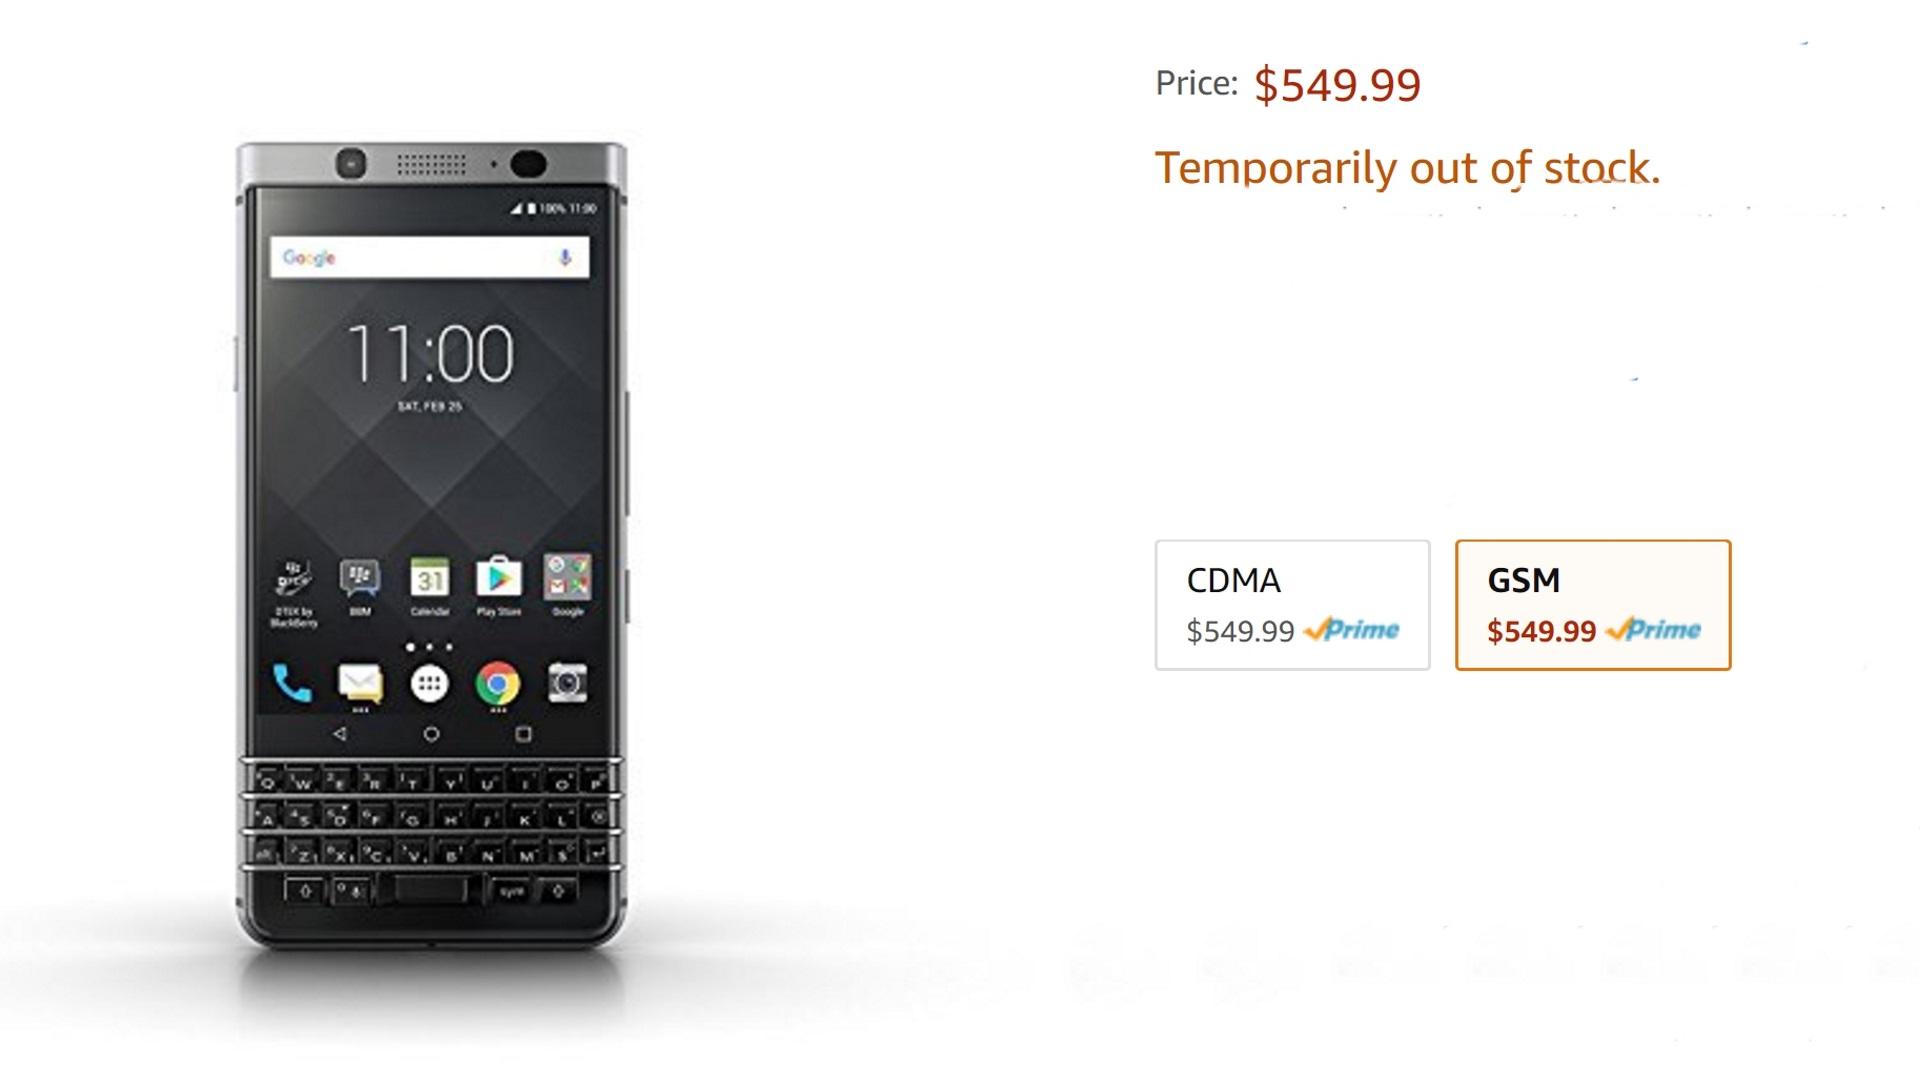 「BlackBerry KEYone」の在庫切れは需要過多のため、TCL CEOが釈明